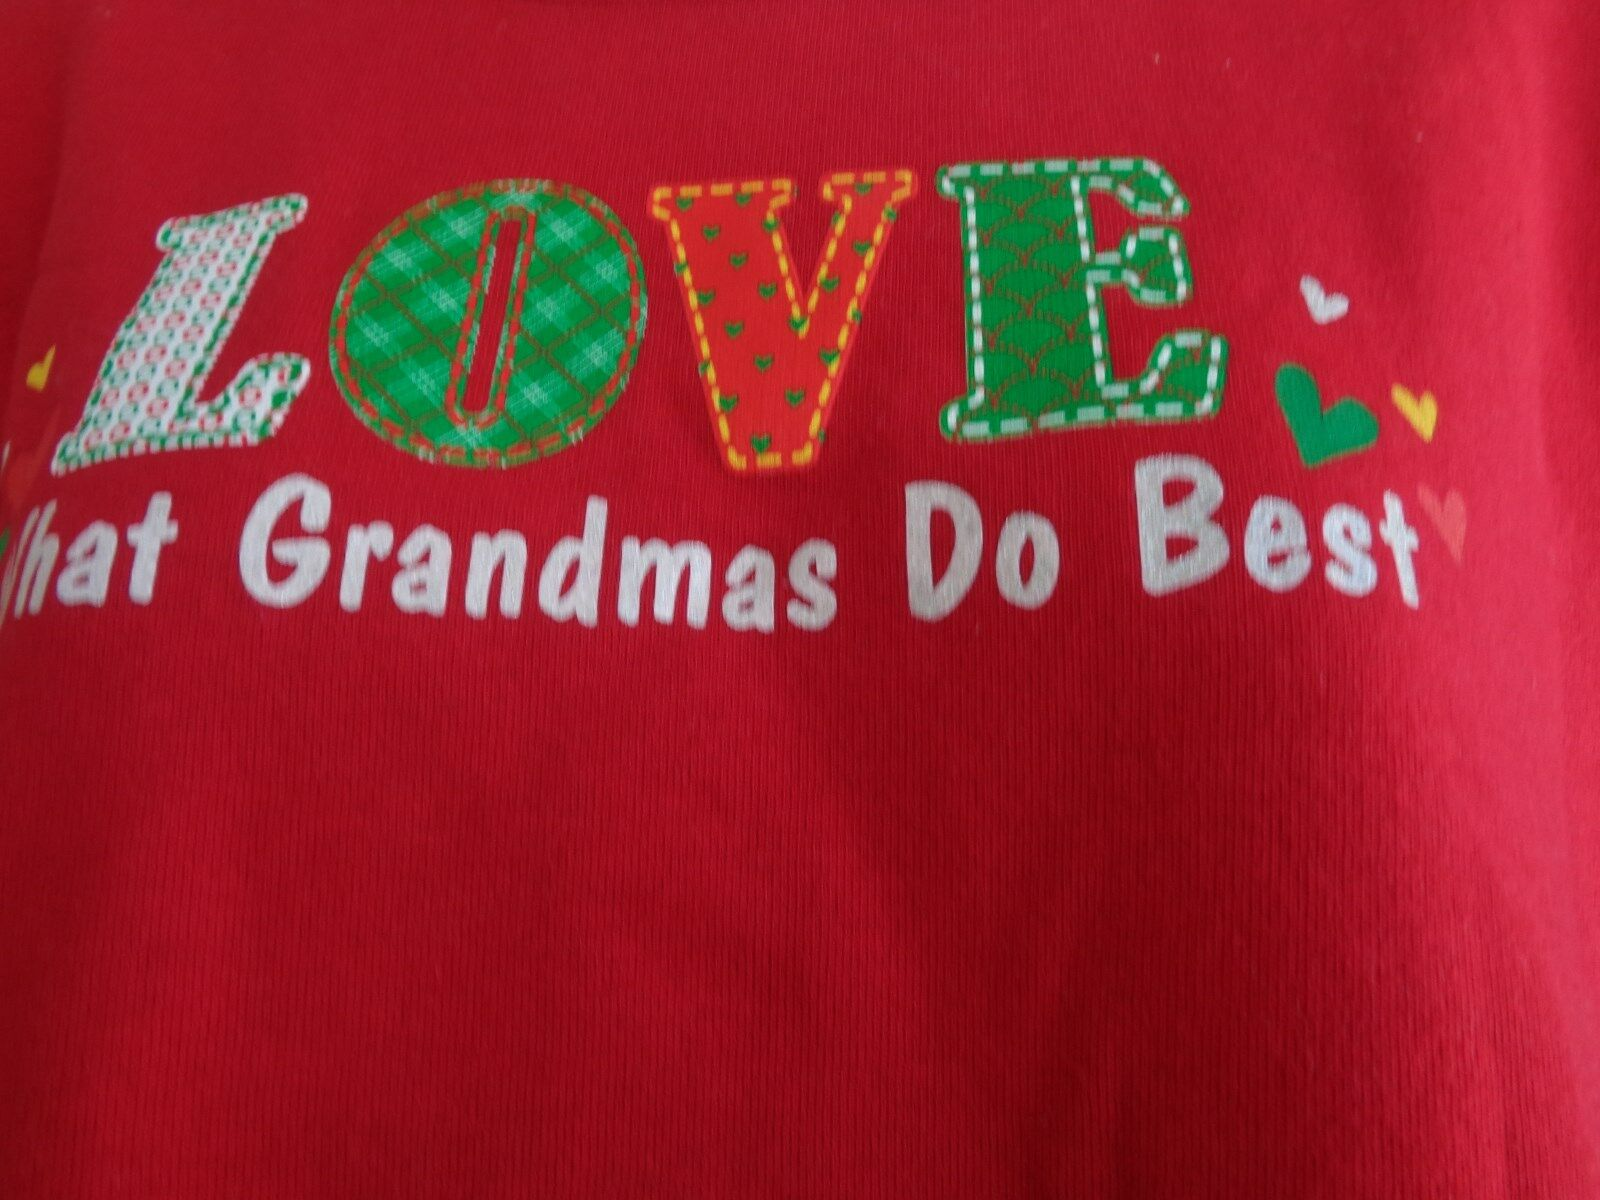 NWT Hanes  S Christmas Glitzy Grandma Love  Graphic Crew Neck  Sweatshirt   Red